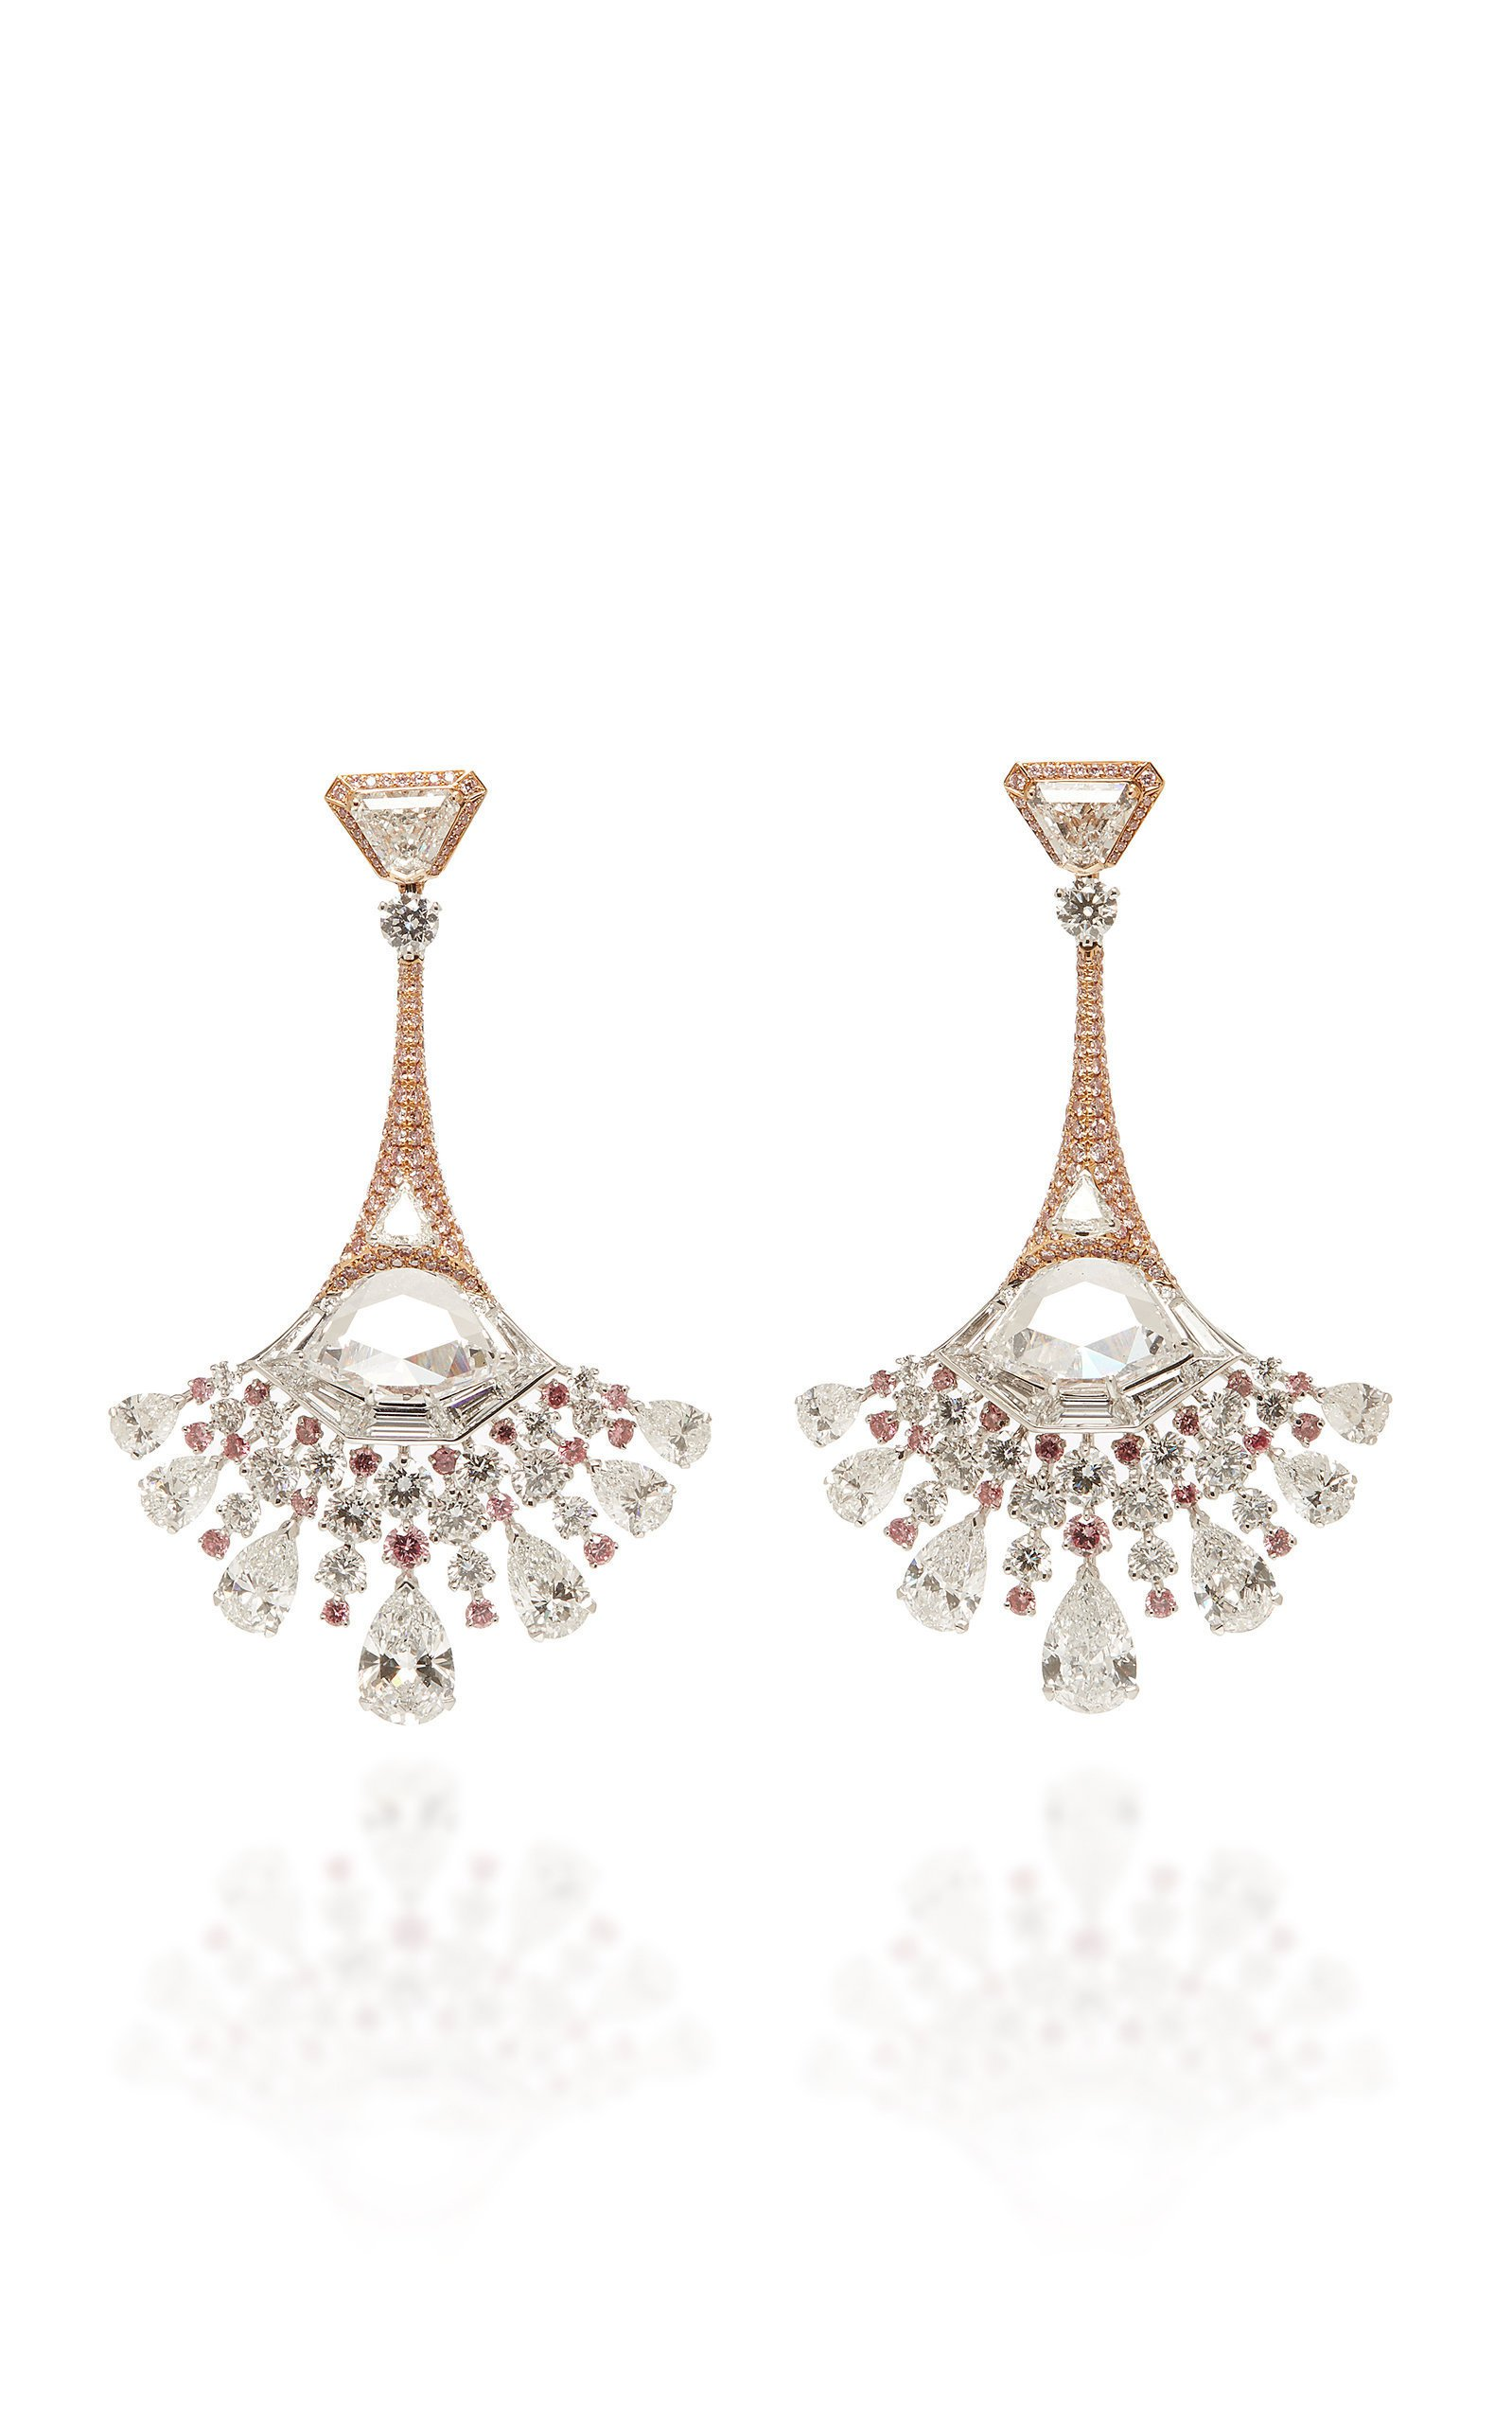 David Morris Peacock Earrings